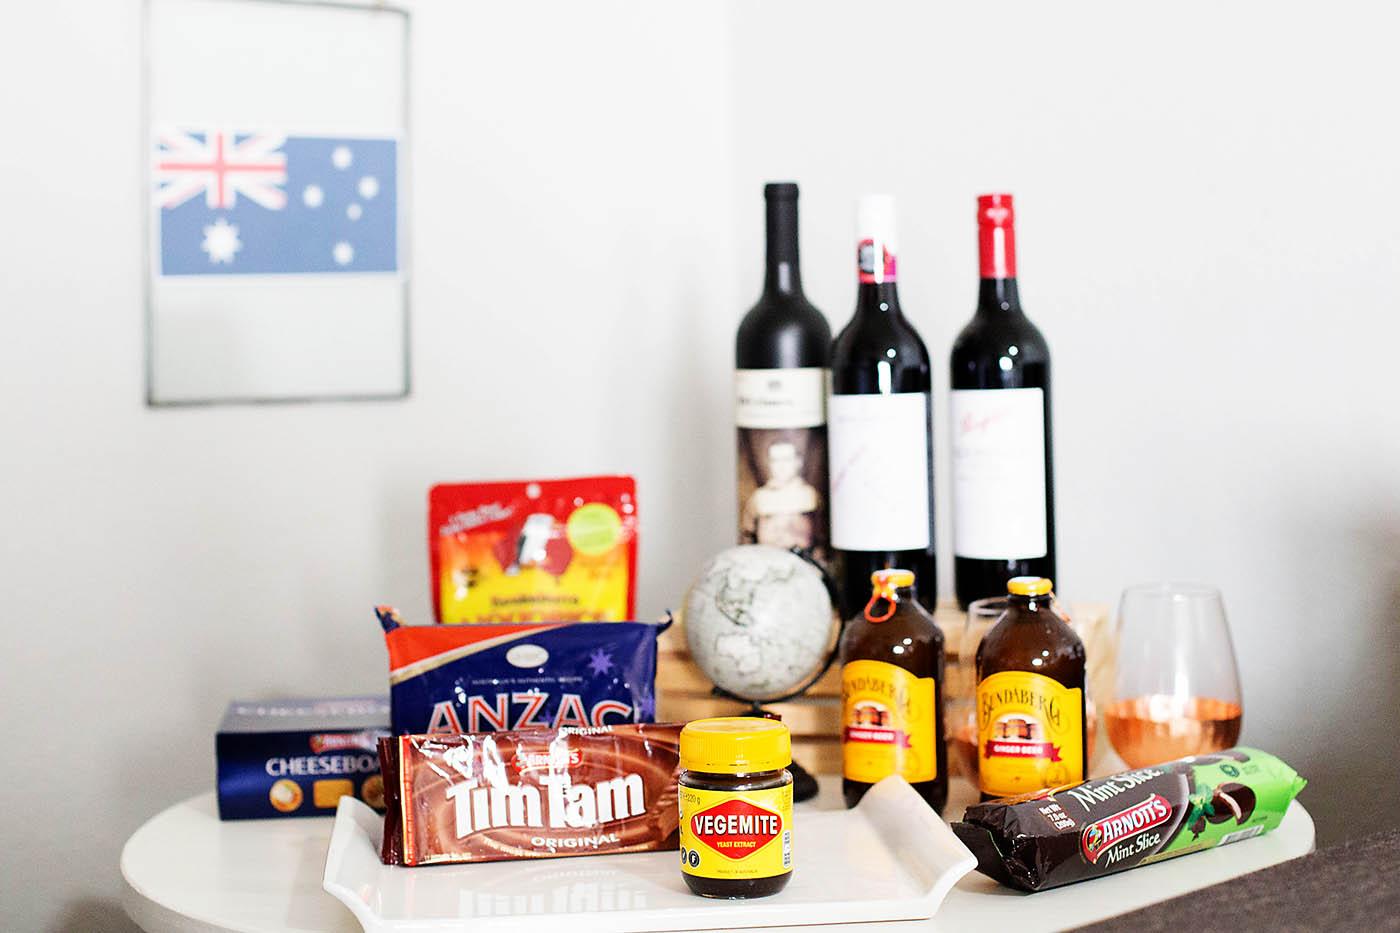 Australian Open Watch Party: Fun Family Night Idea - All for